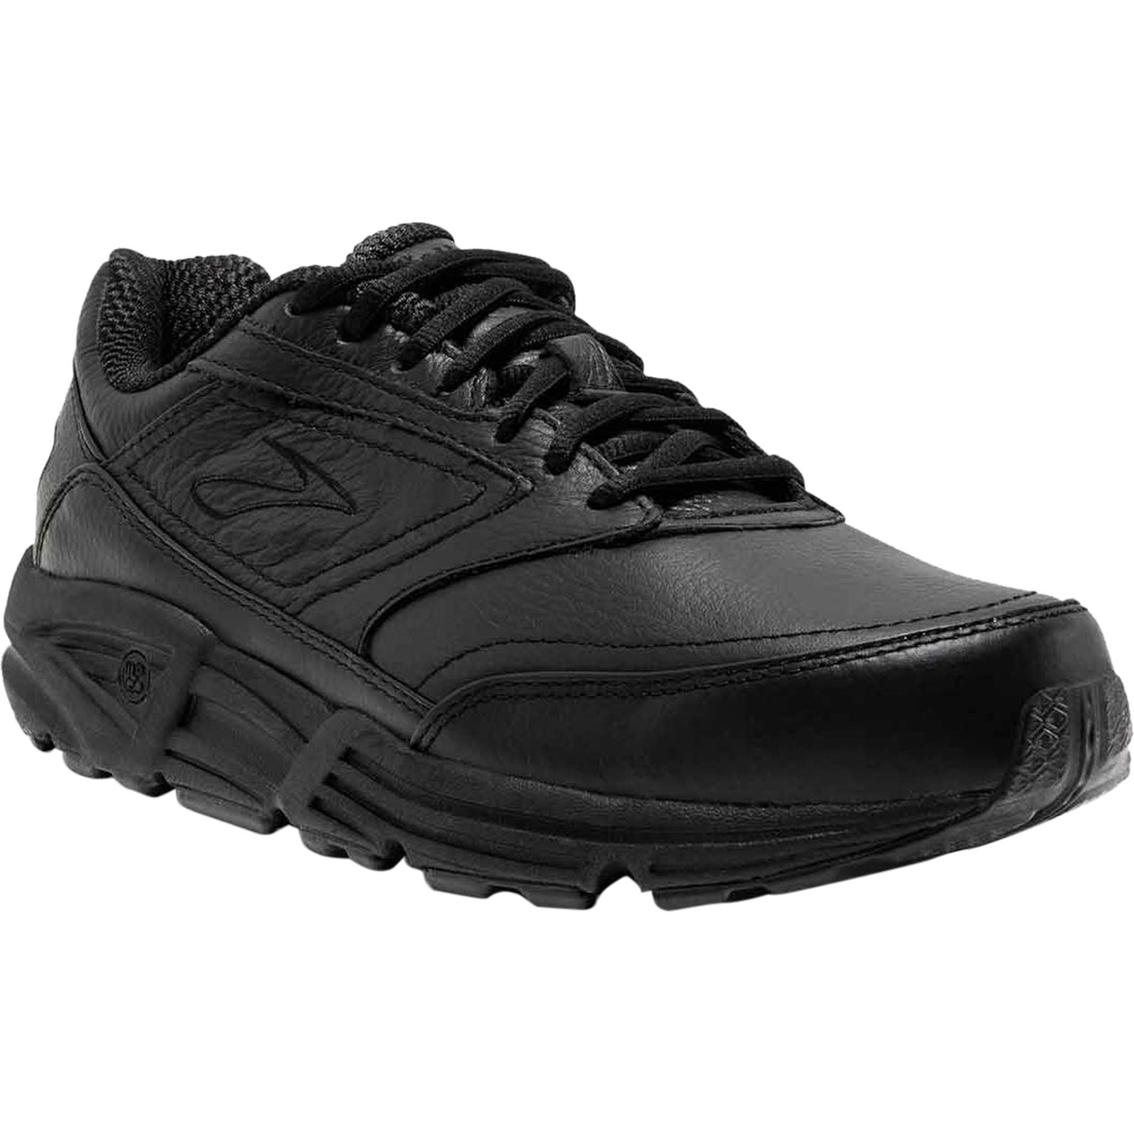 7b1b98a5989 Brooks Men s Addiction Walker Shoes